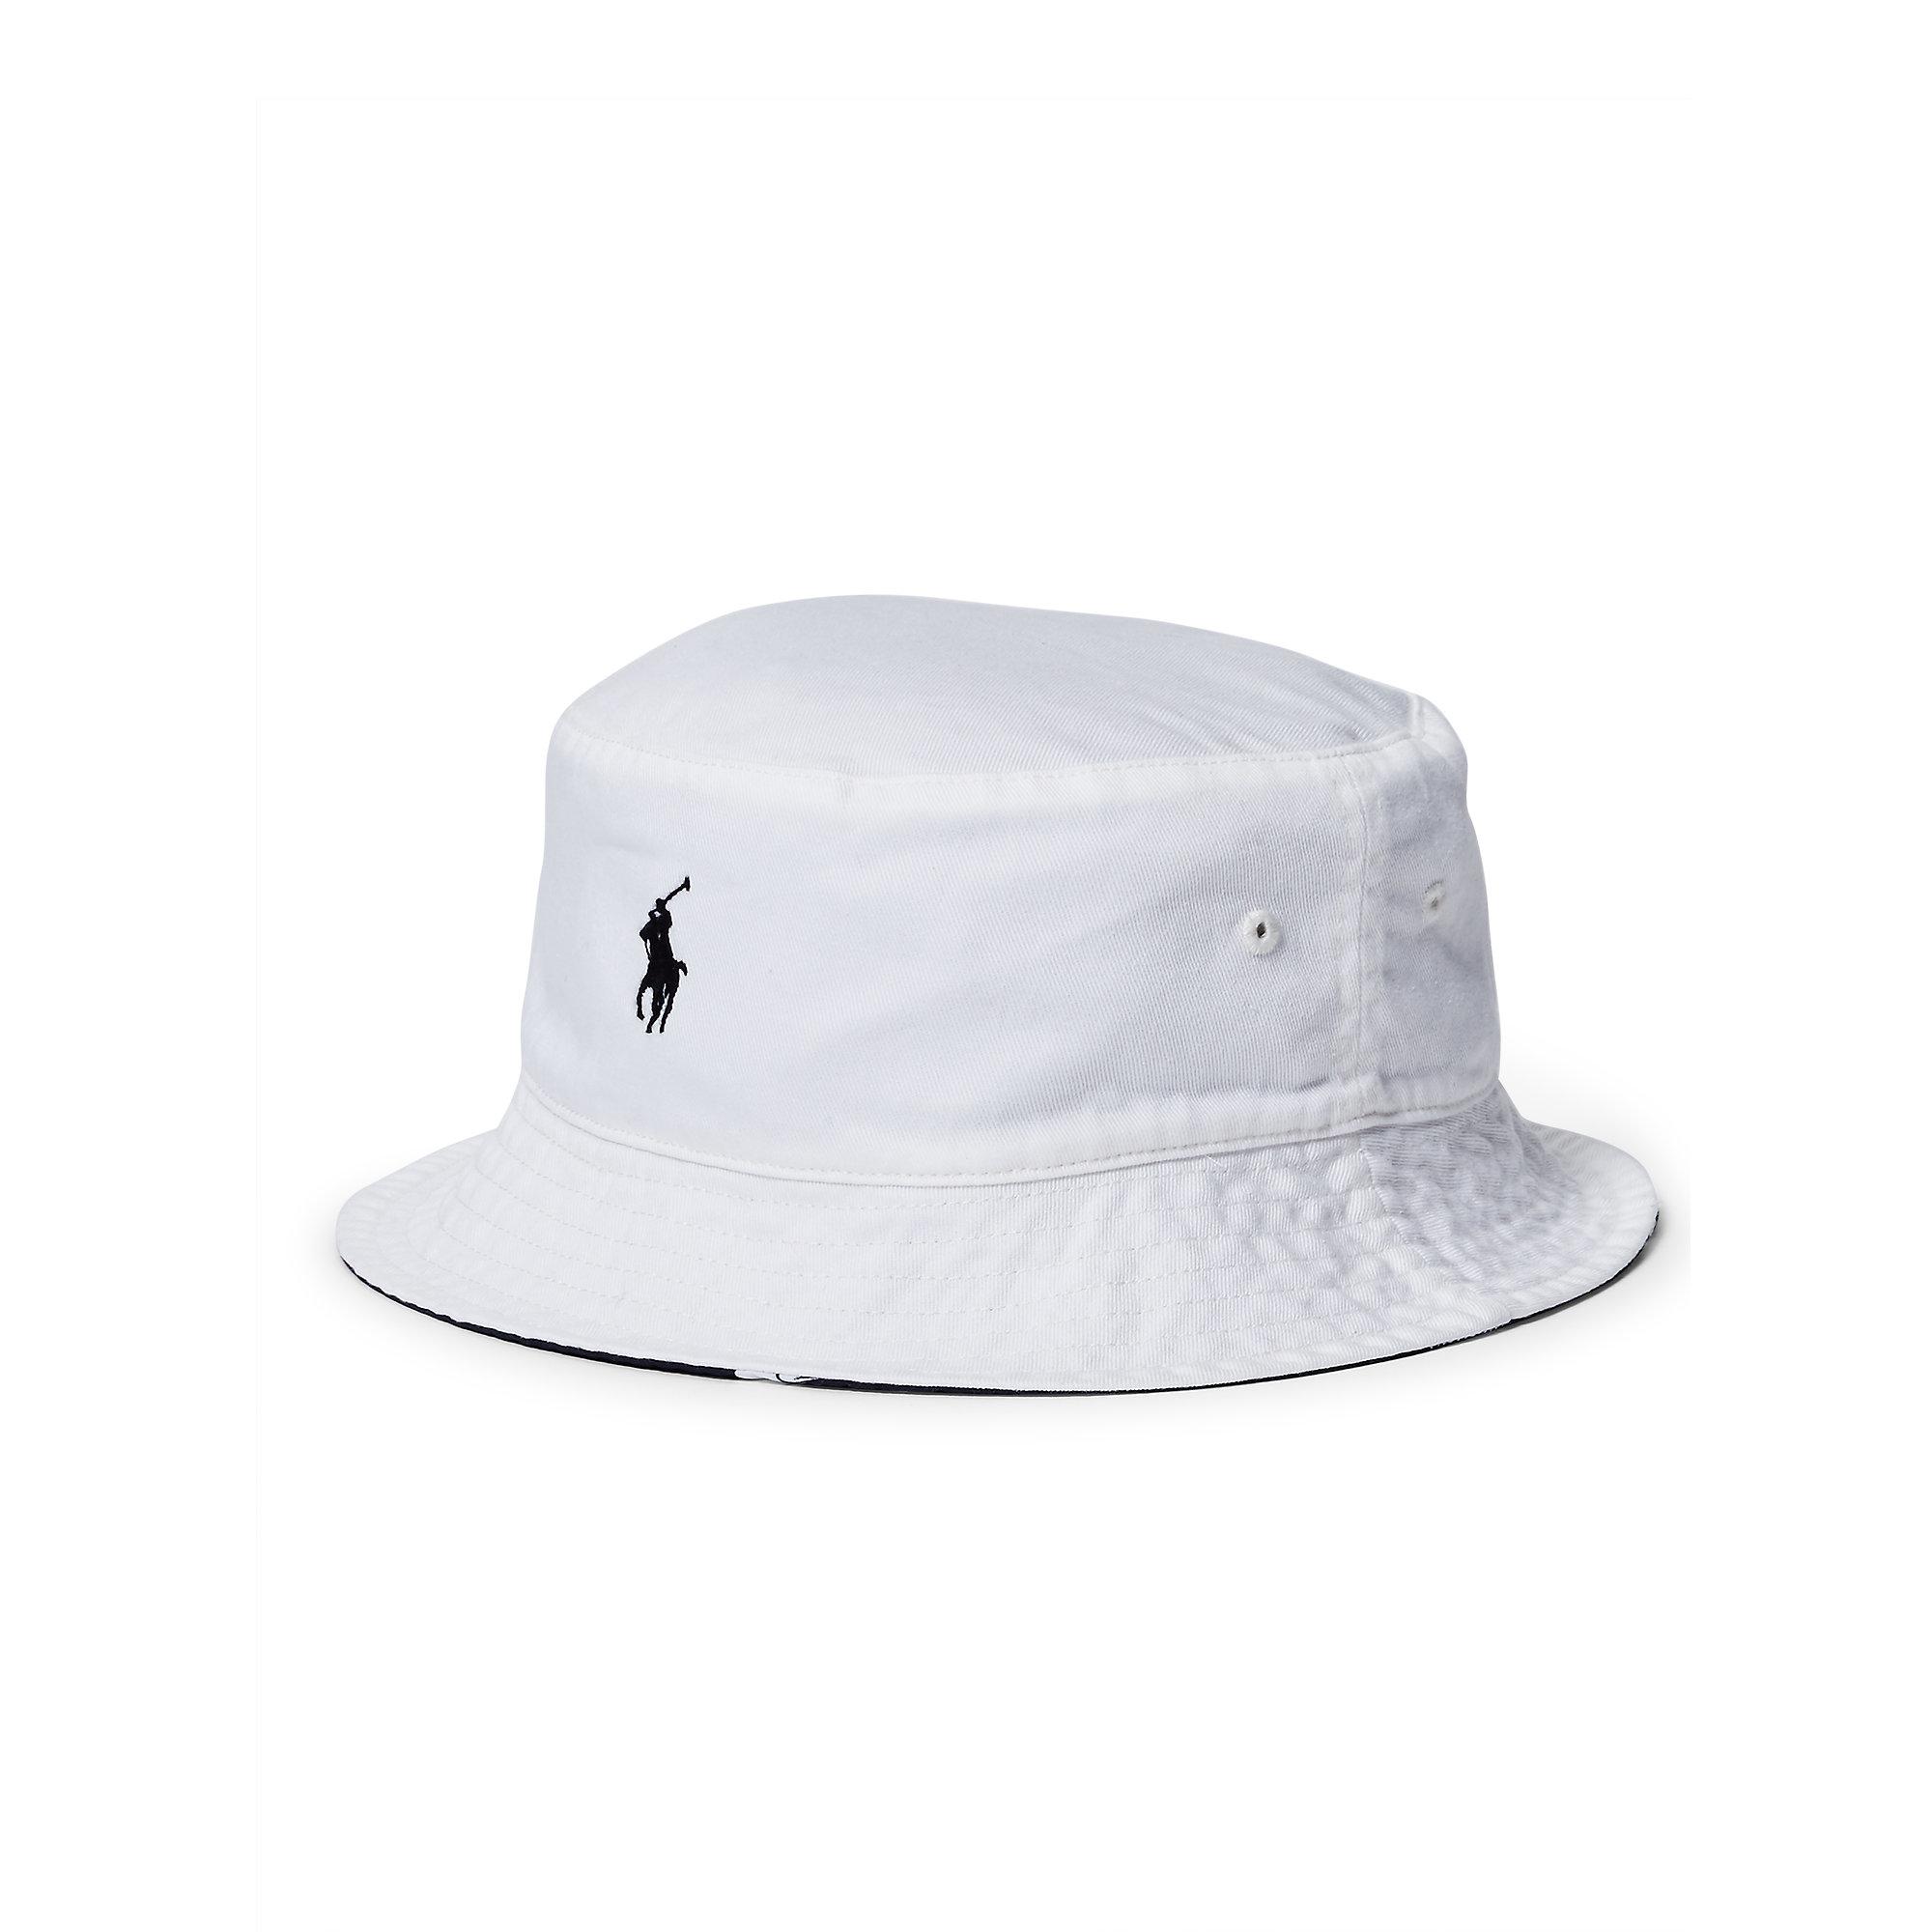 9b99de5ab09 Lyst - Polo Ralph Lauren Reversible Twill Bucket Hat in White for Men